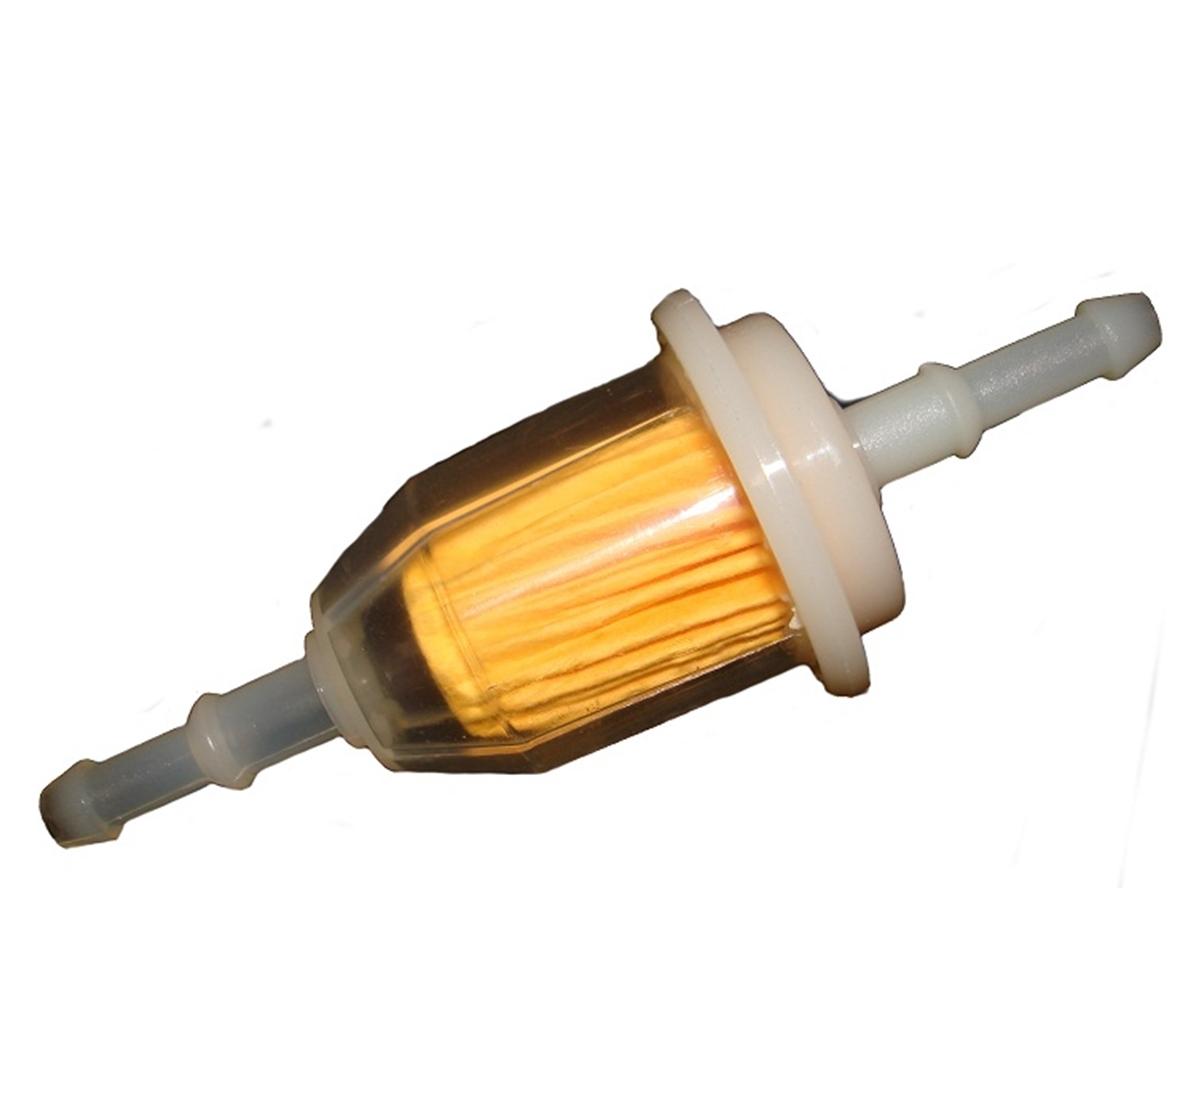 John Deere 445 Fuel Filter Filters 455 Wiring Diagram Lawn Tractor Get Free